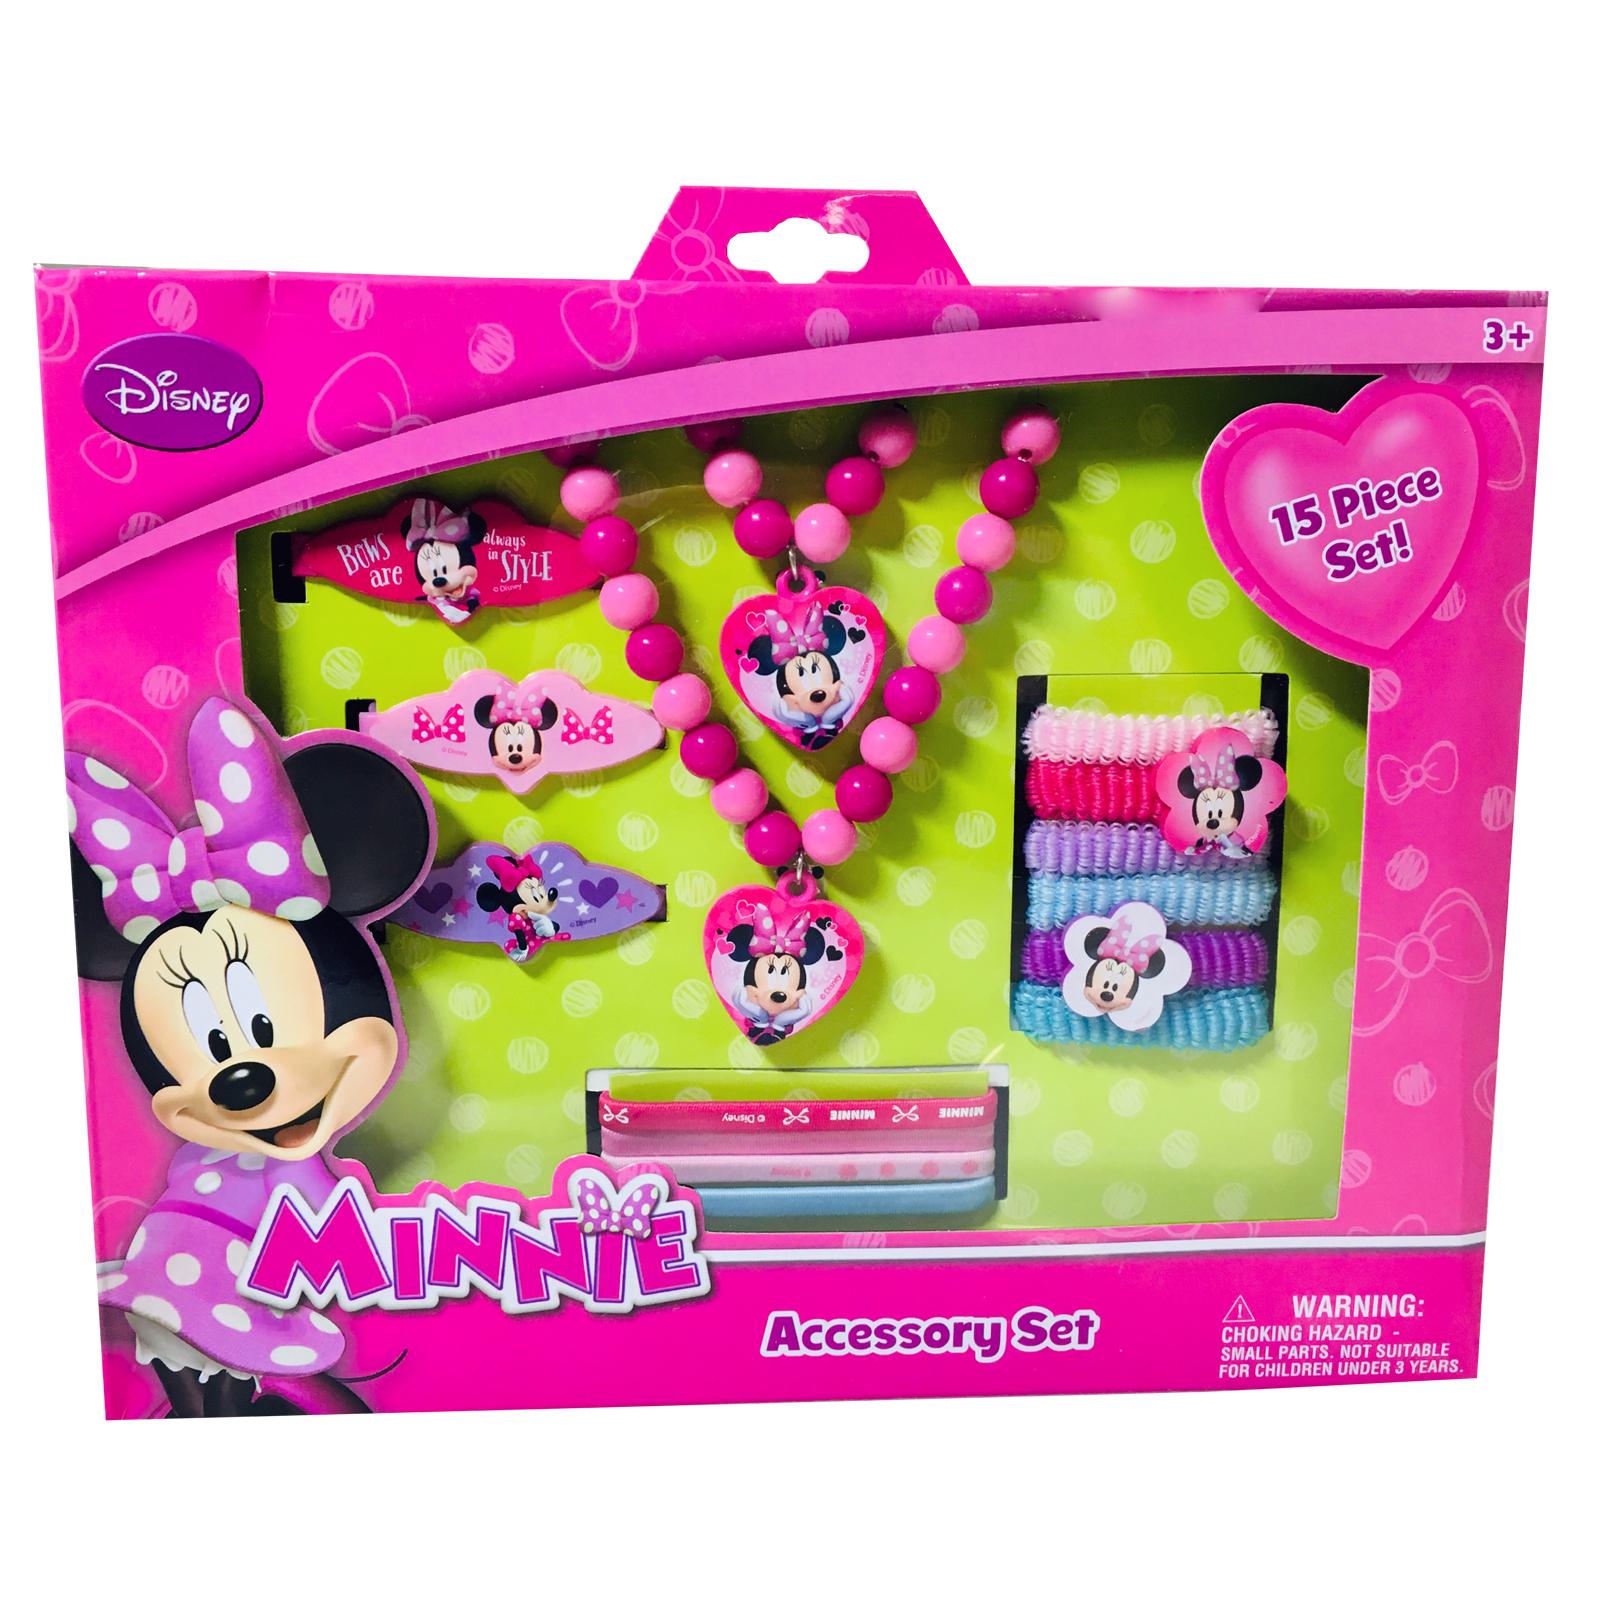 166e908108d Disney Minnie Mouse 15 PC Accessory Set Pretend Play Dress Up Jewelry  Fantasy